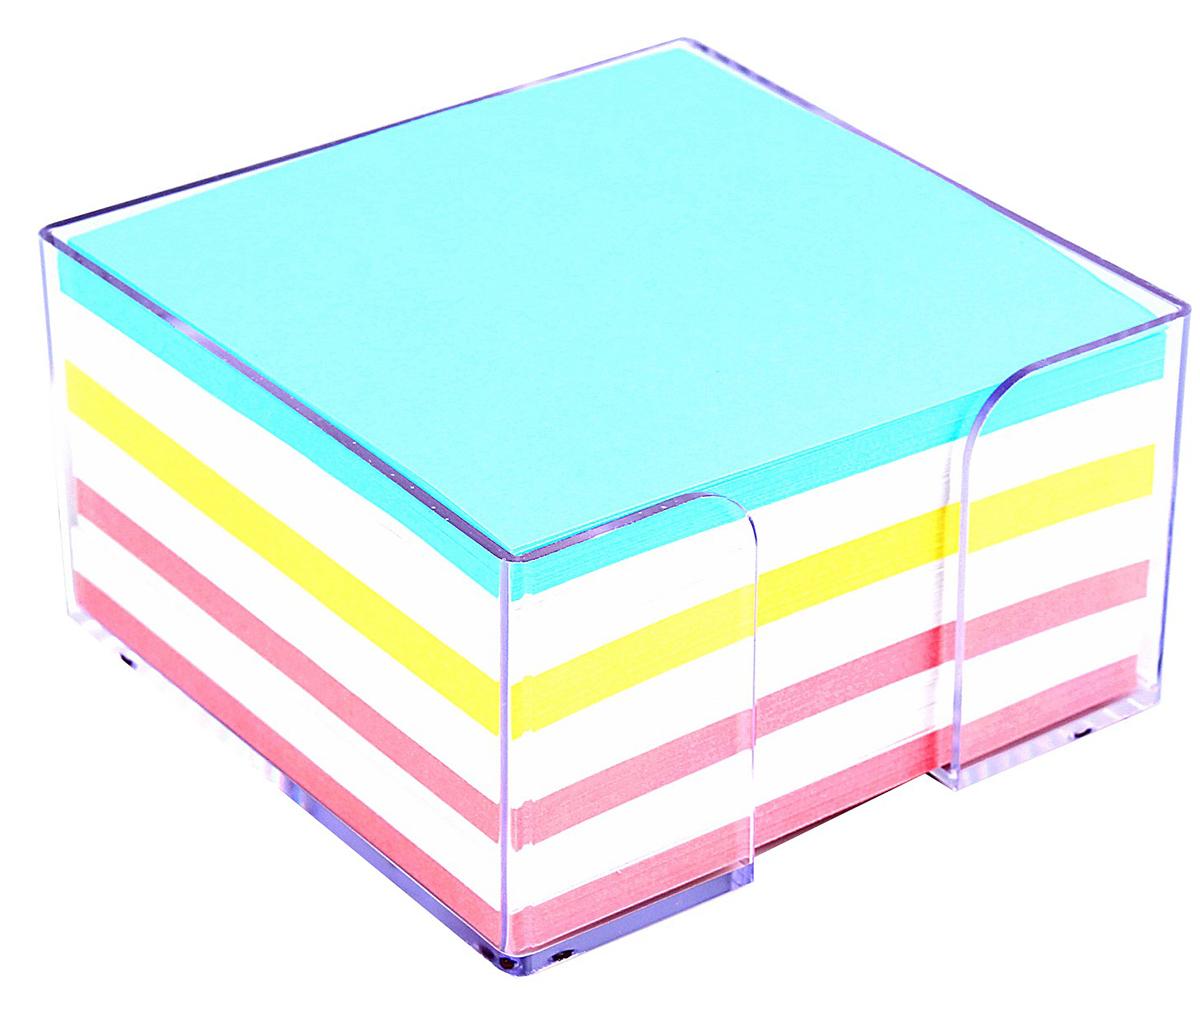 Стамм Блок для записей Эконом 9 x 9 см блок для записей тюмень 9 x 9 см 150 листов